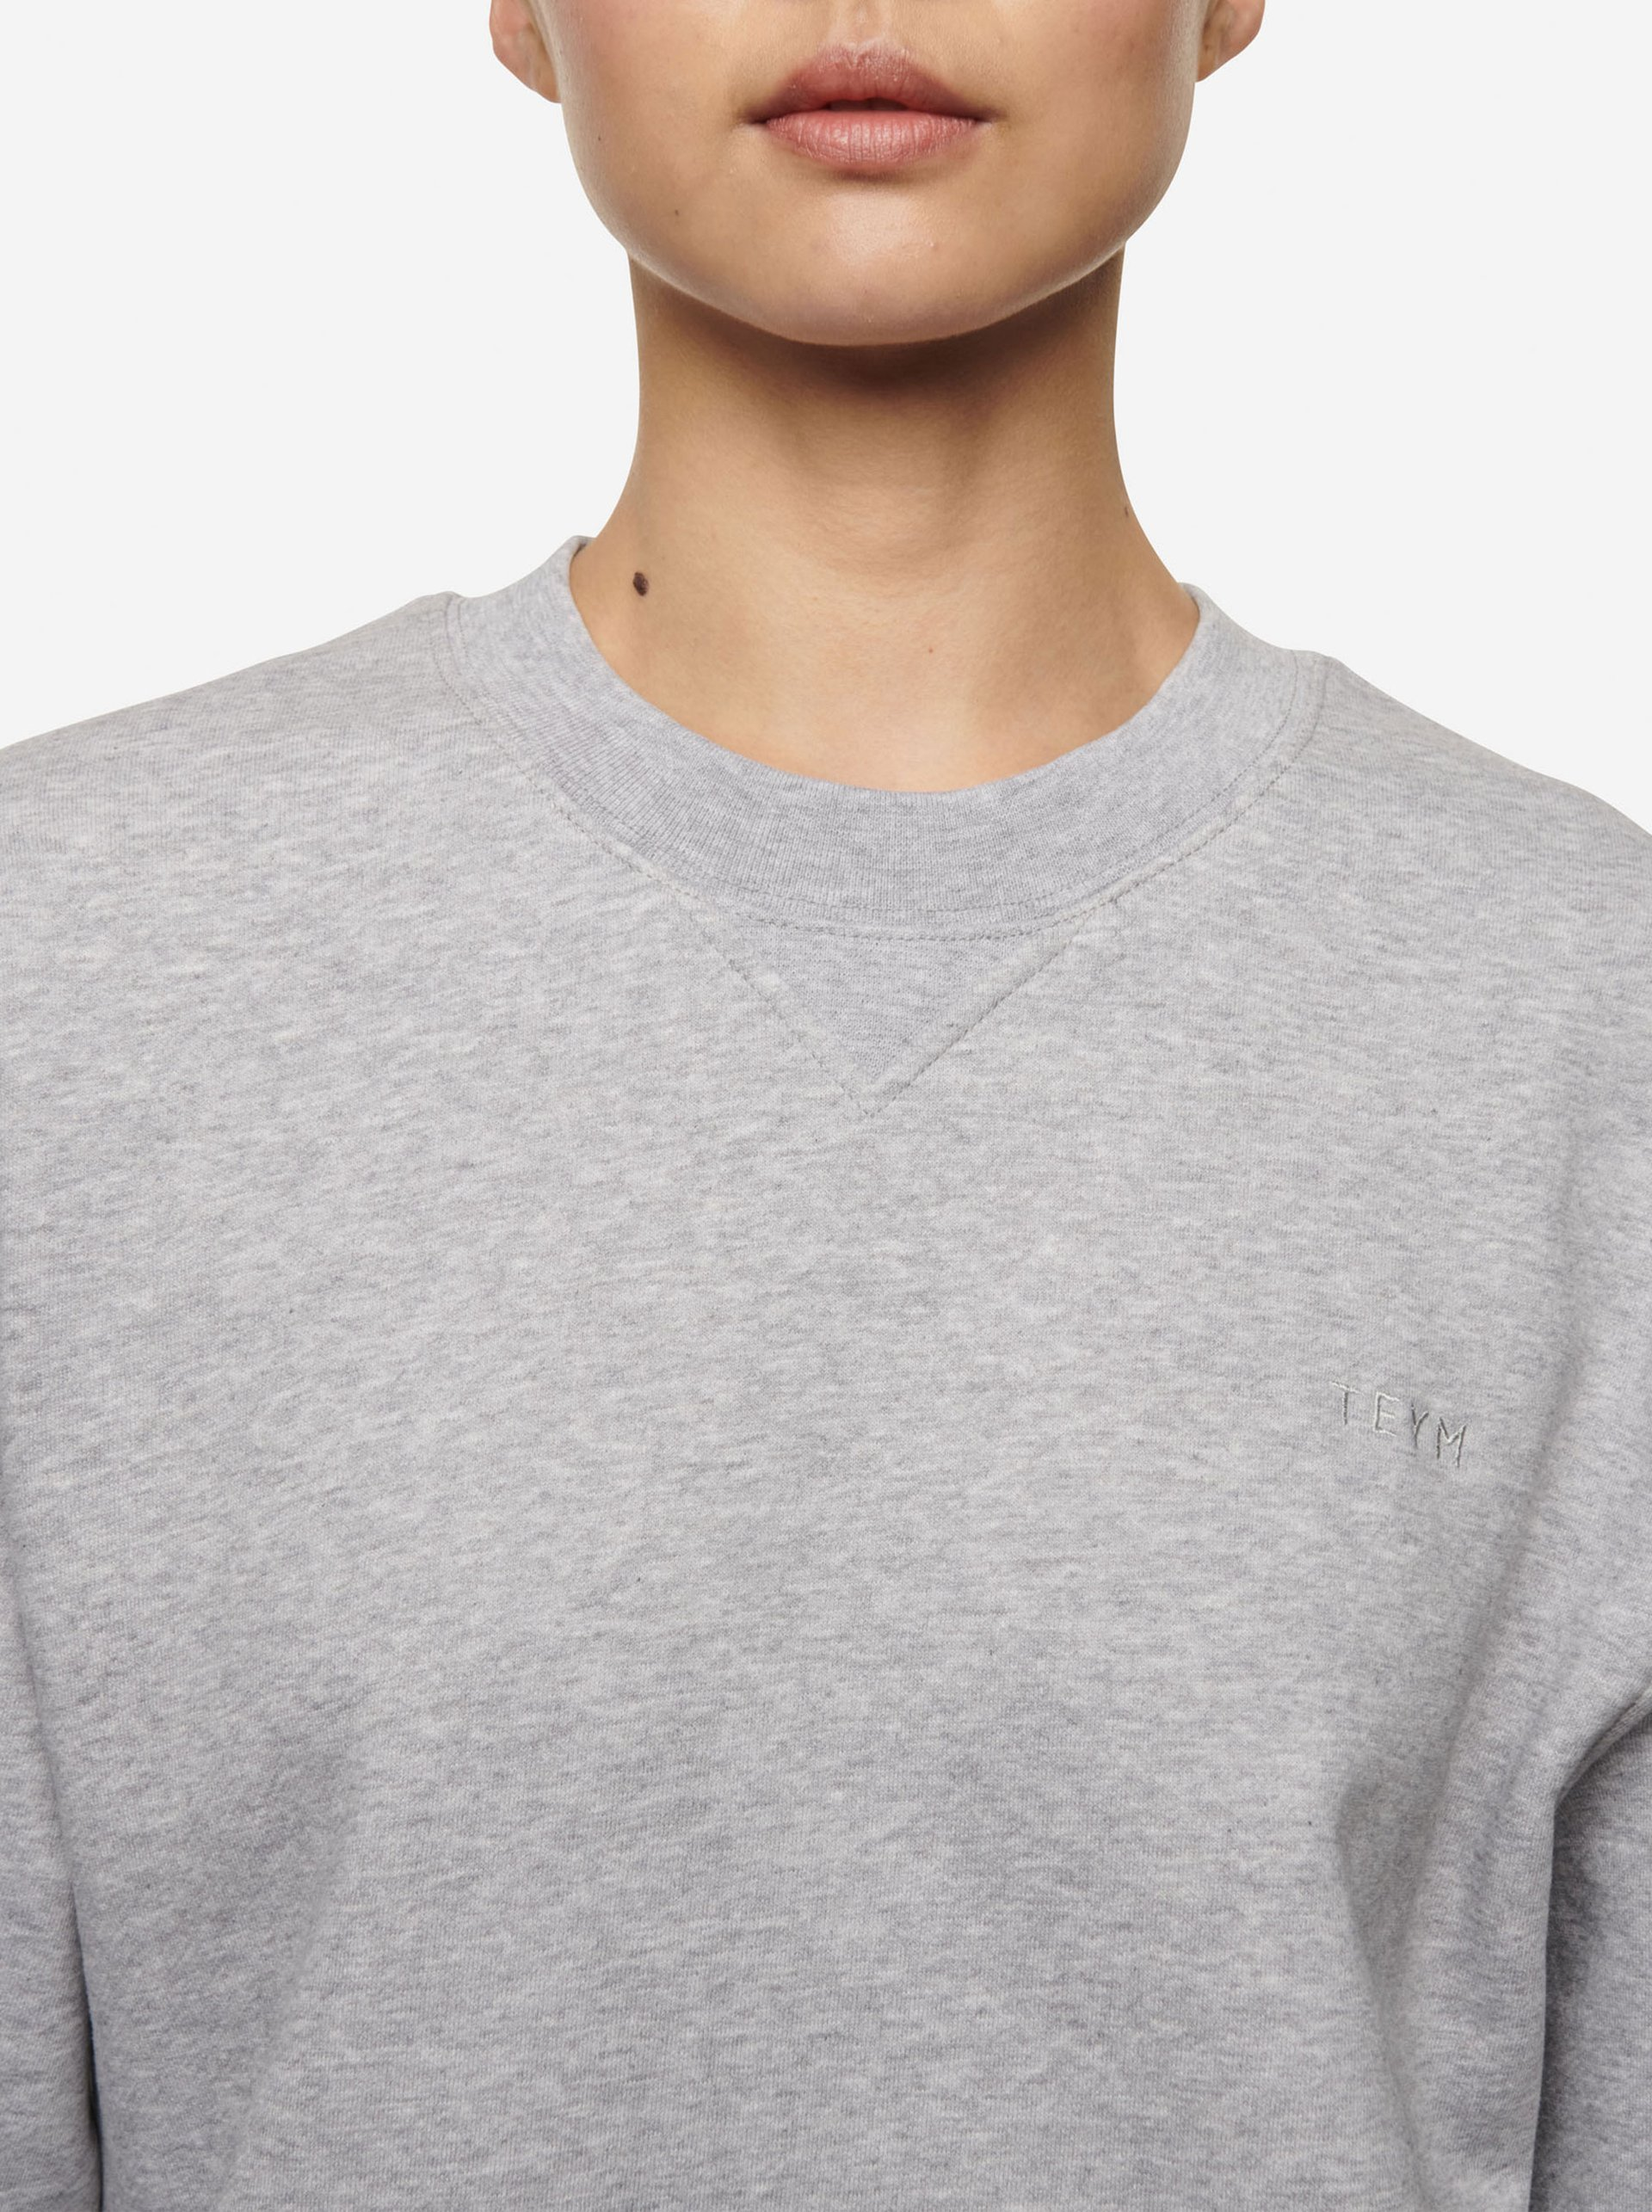 Teym-TheSweatshirt-Women-Grey06